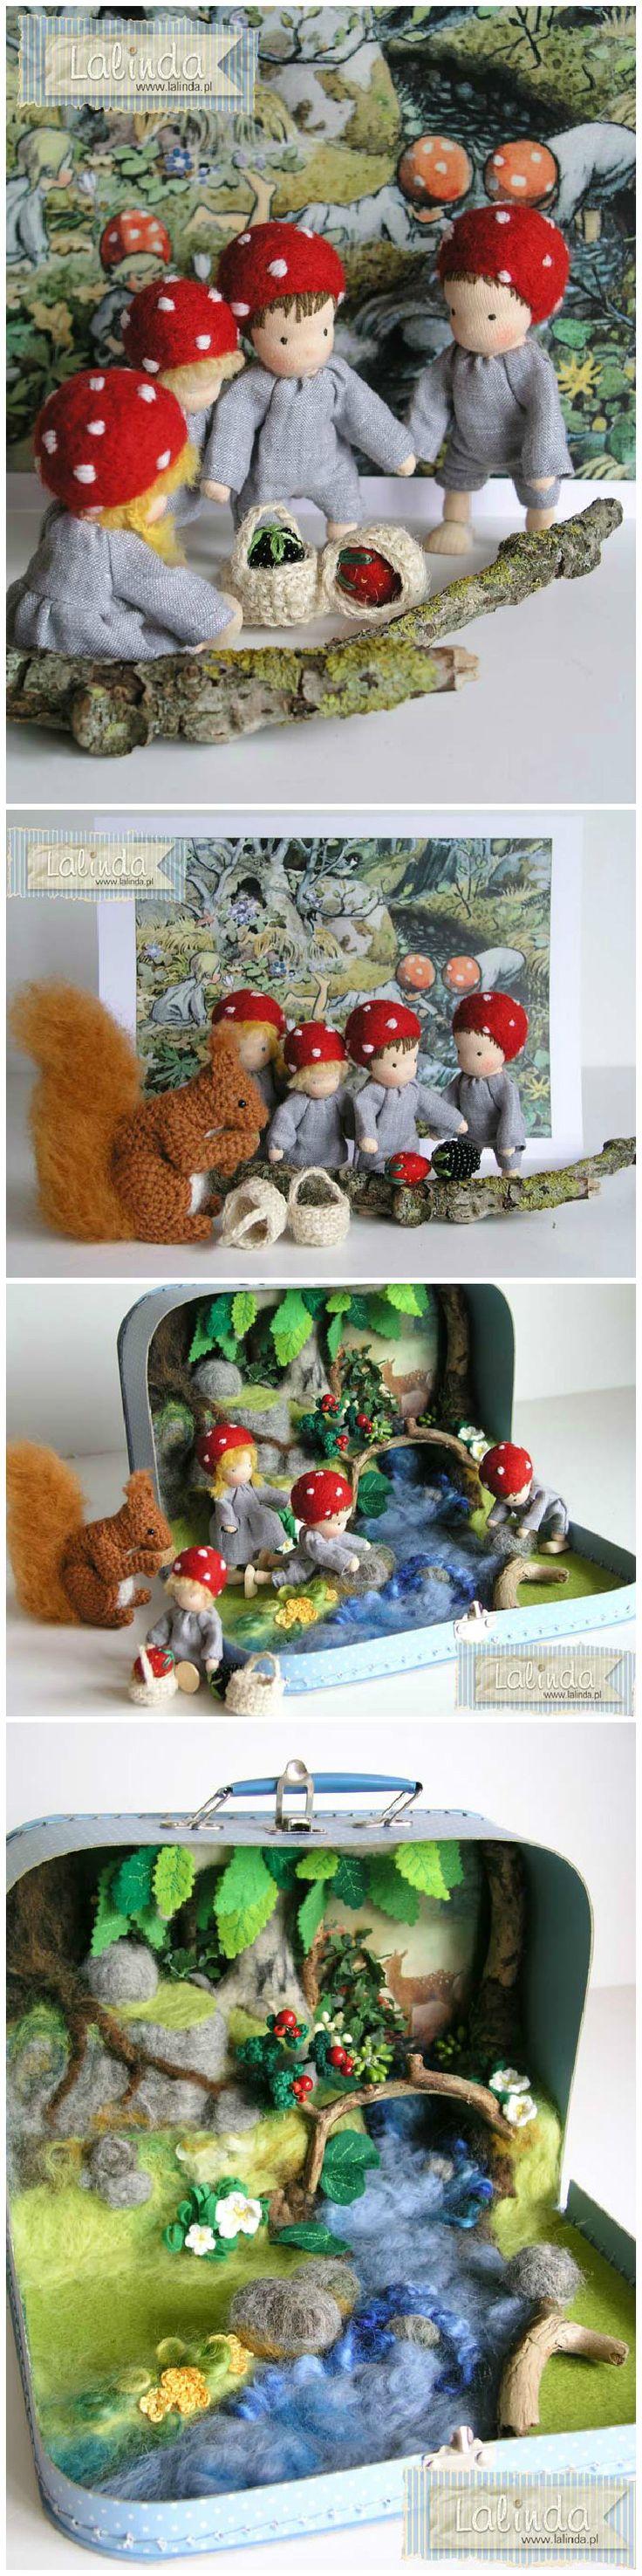 Children of the forest Elsa Beskow play set felt absolutely gorgeous